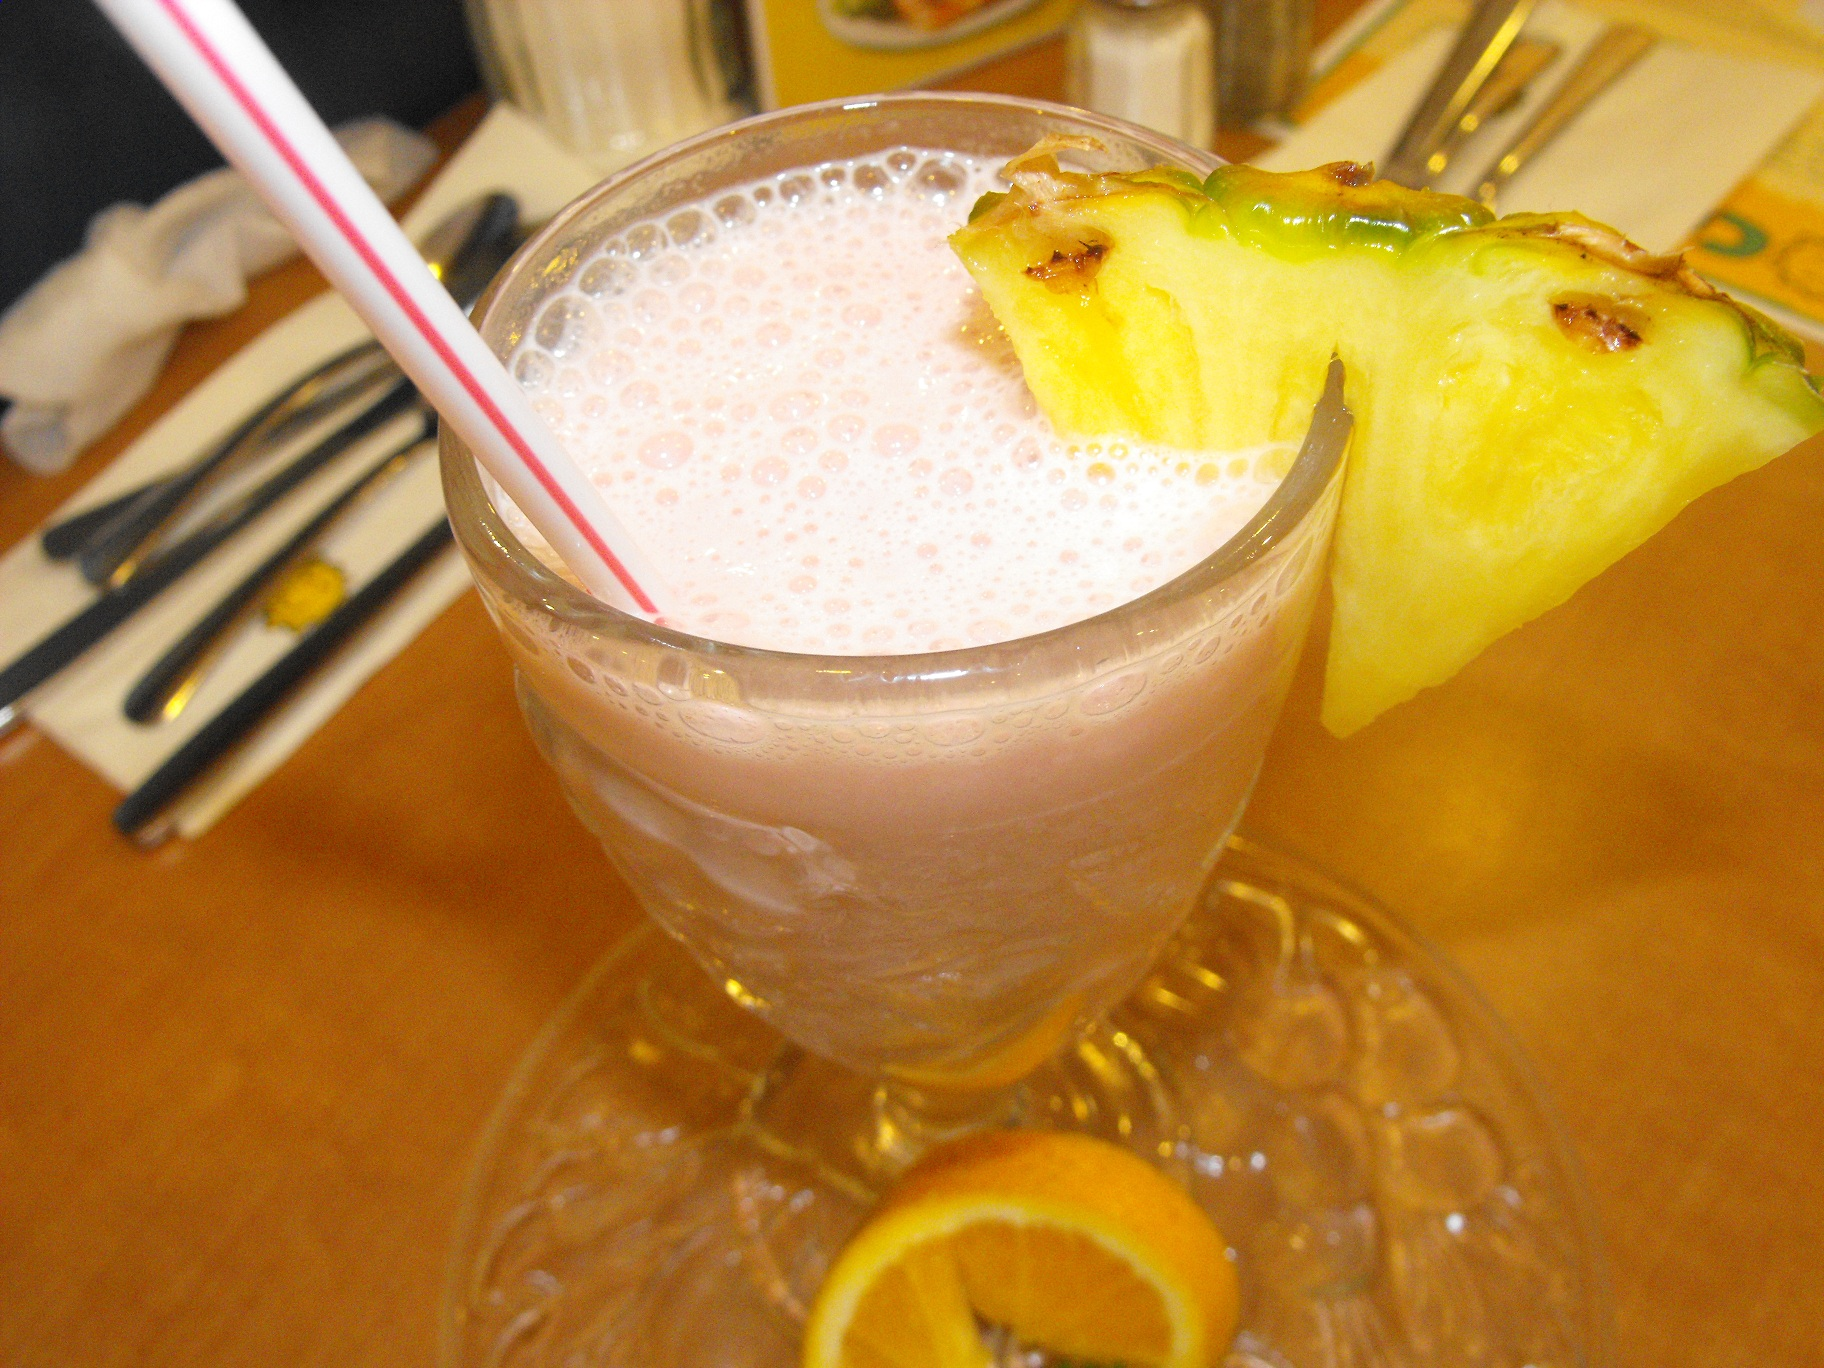 http://foodloader.net/cutie_2011-03-17_Strawberry-Banana_Smoothie.jpg